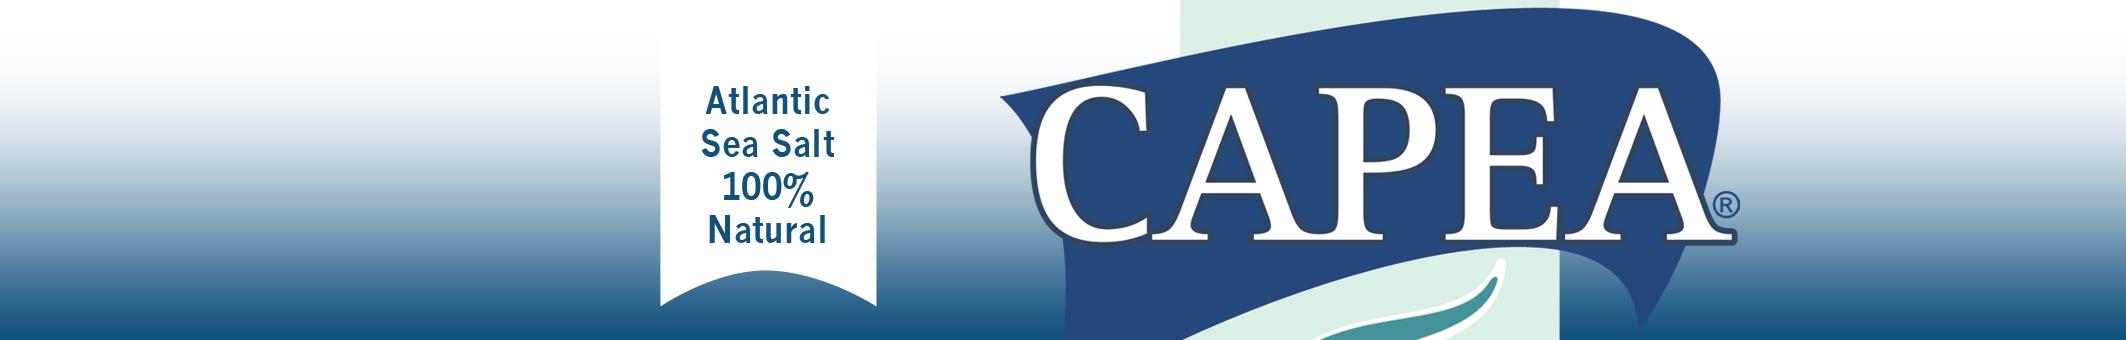 CAPEA logo